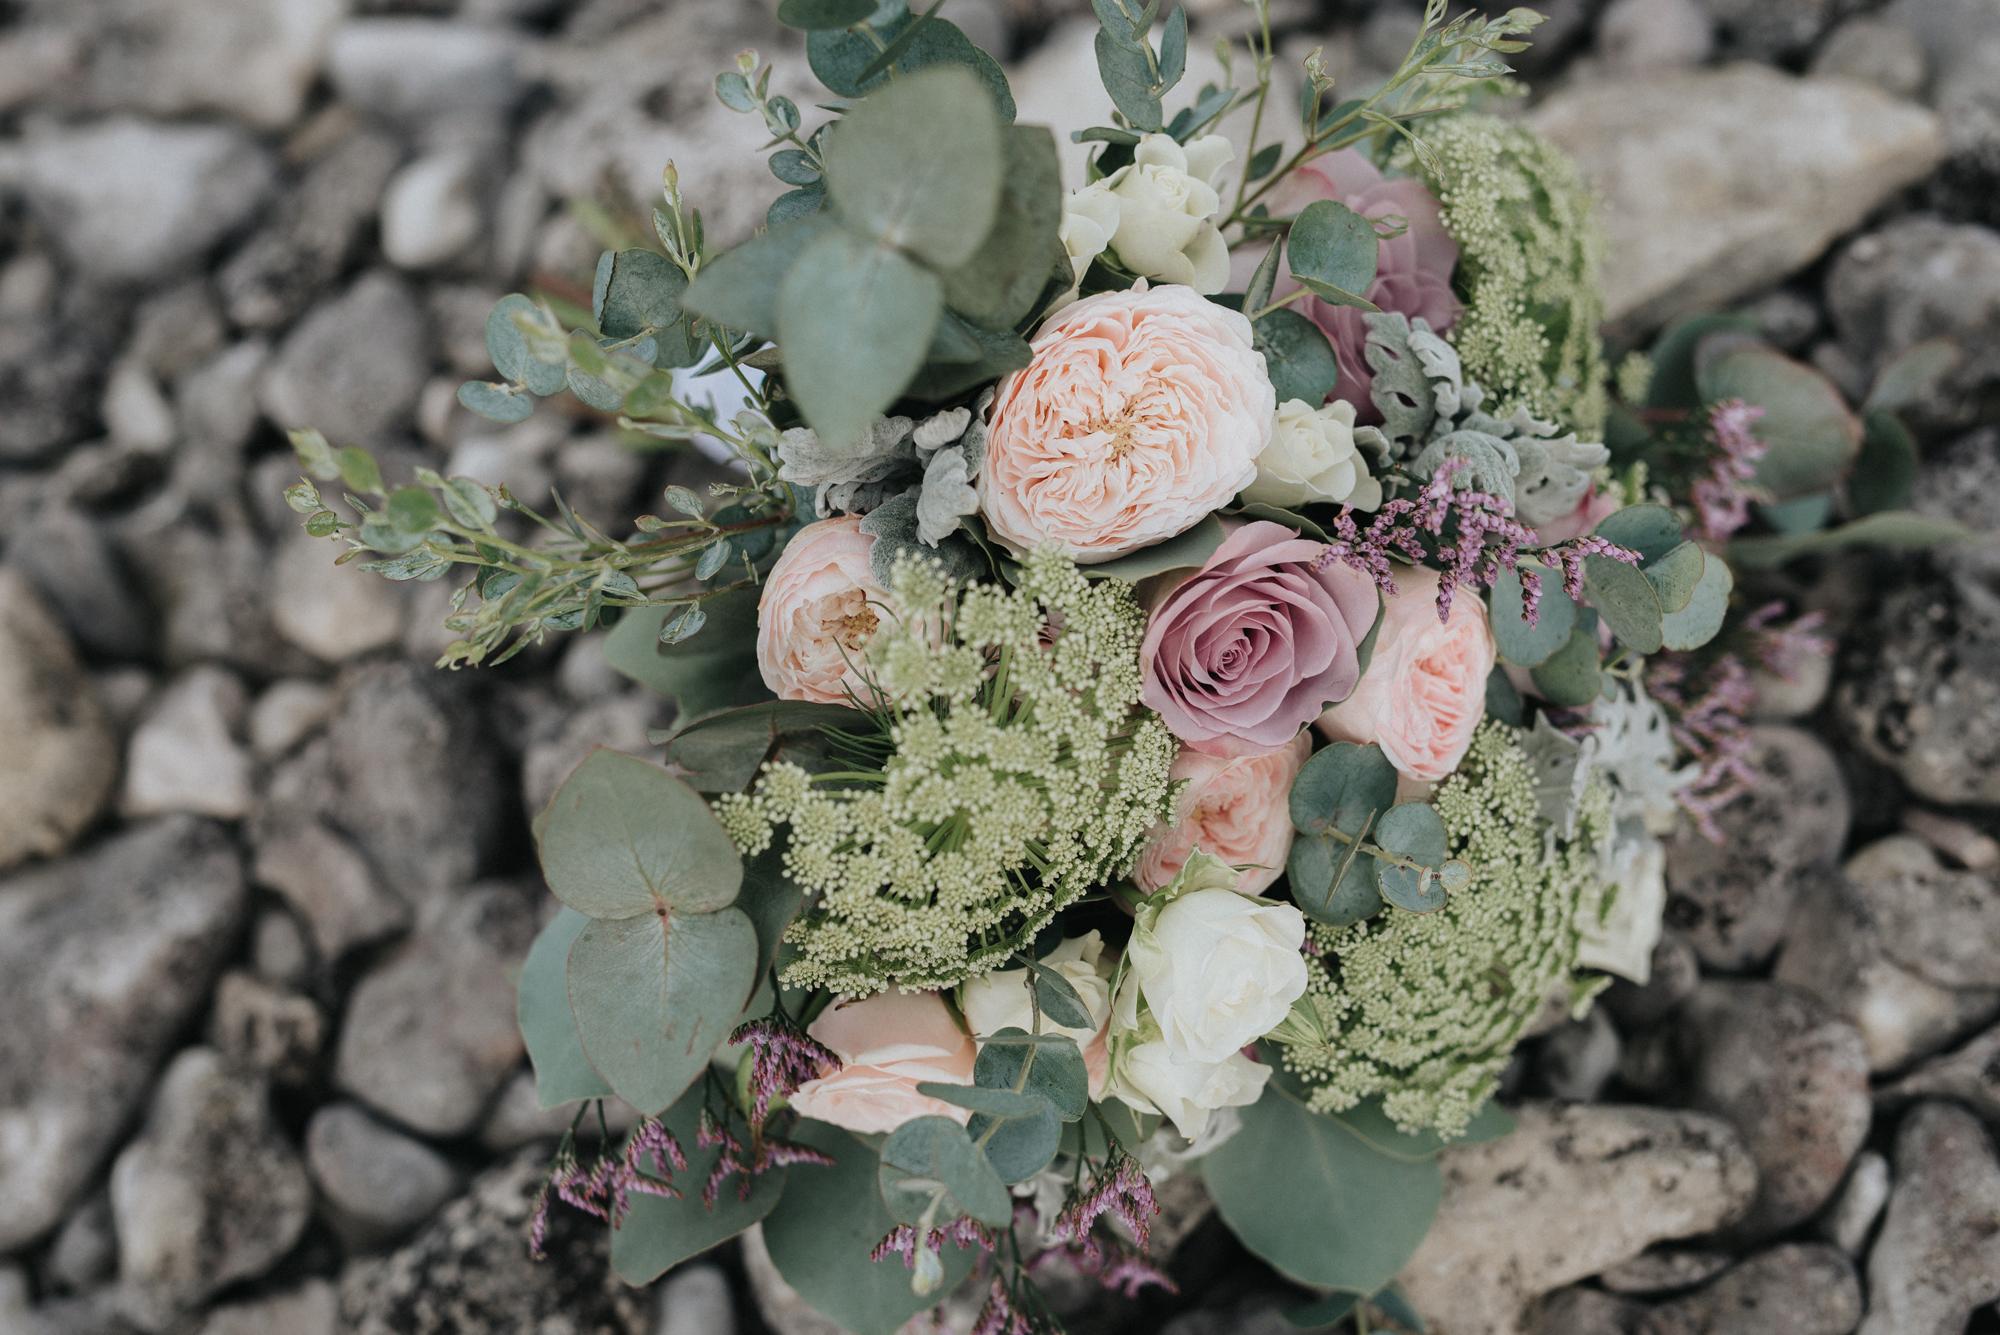 040-irisdals-blomsterhandel-brudbukett-neas-fotografi.jpg